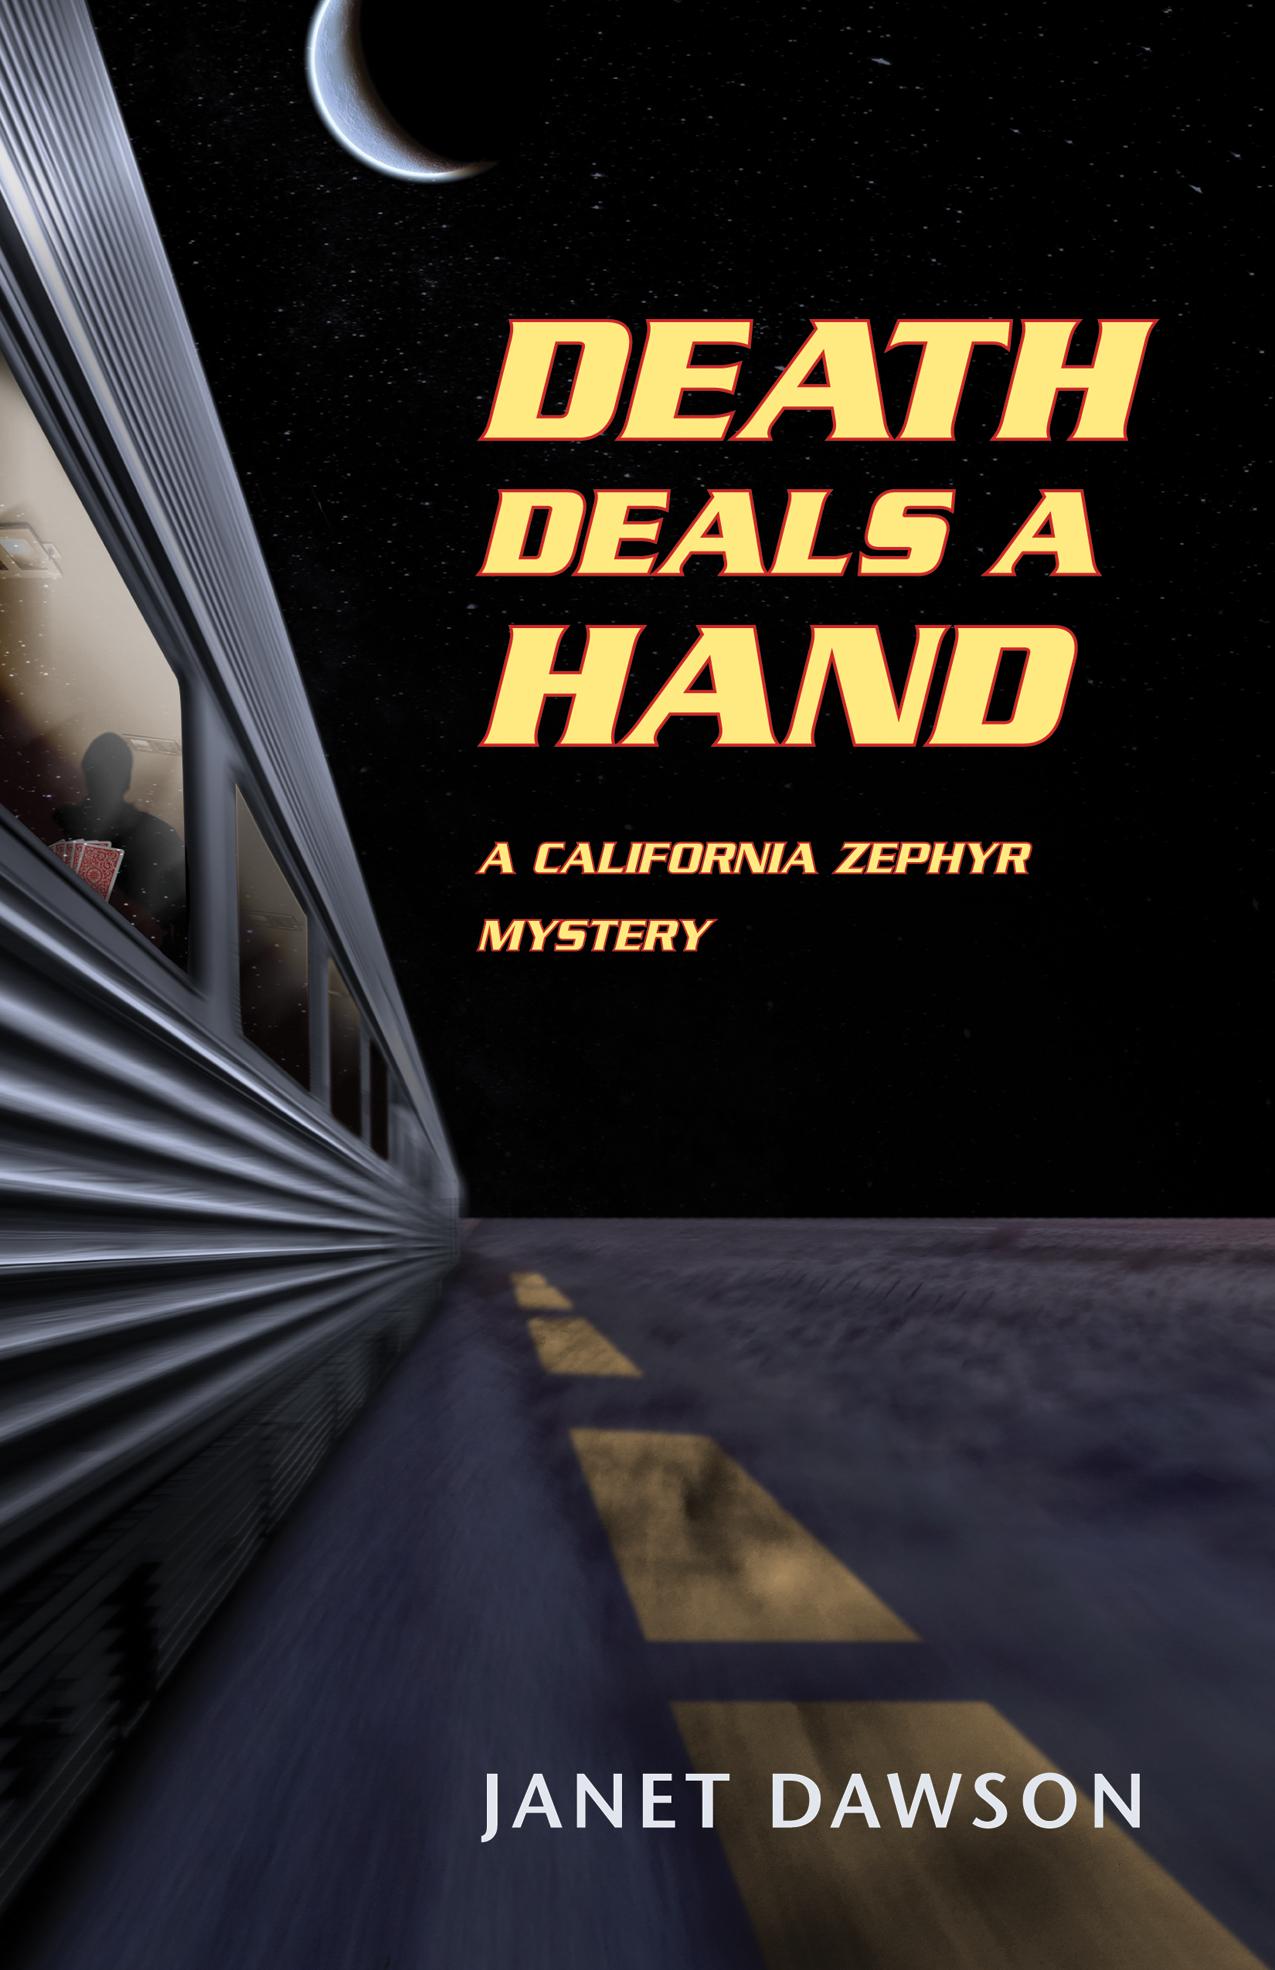 DeathDealsHand_c1_hi-res